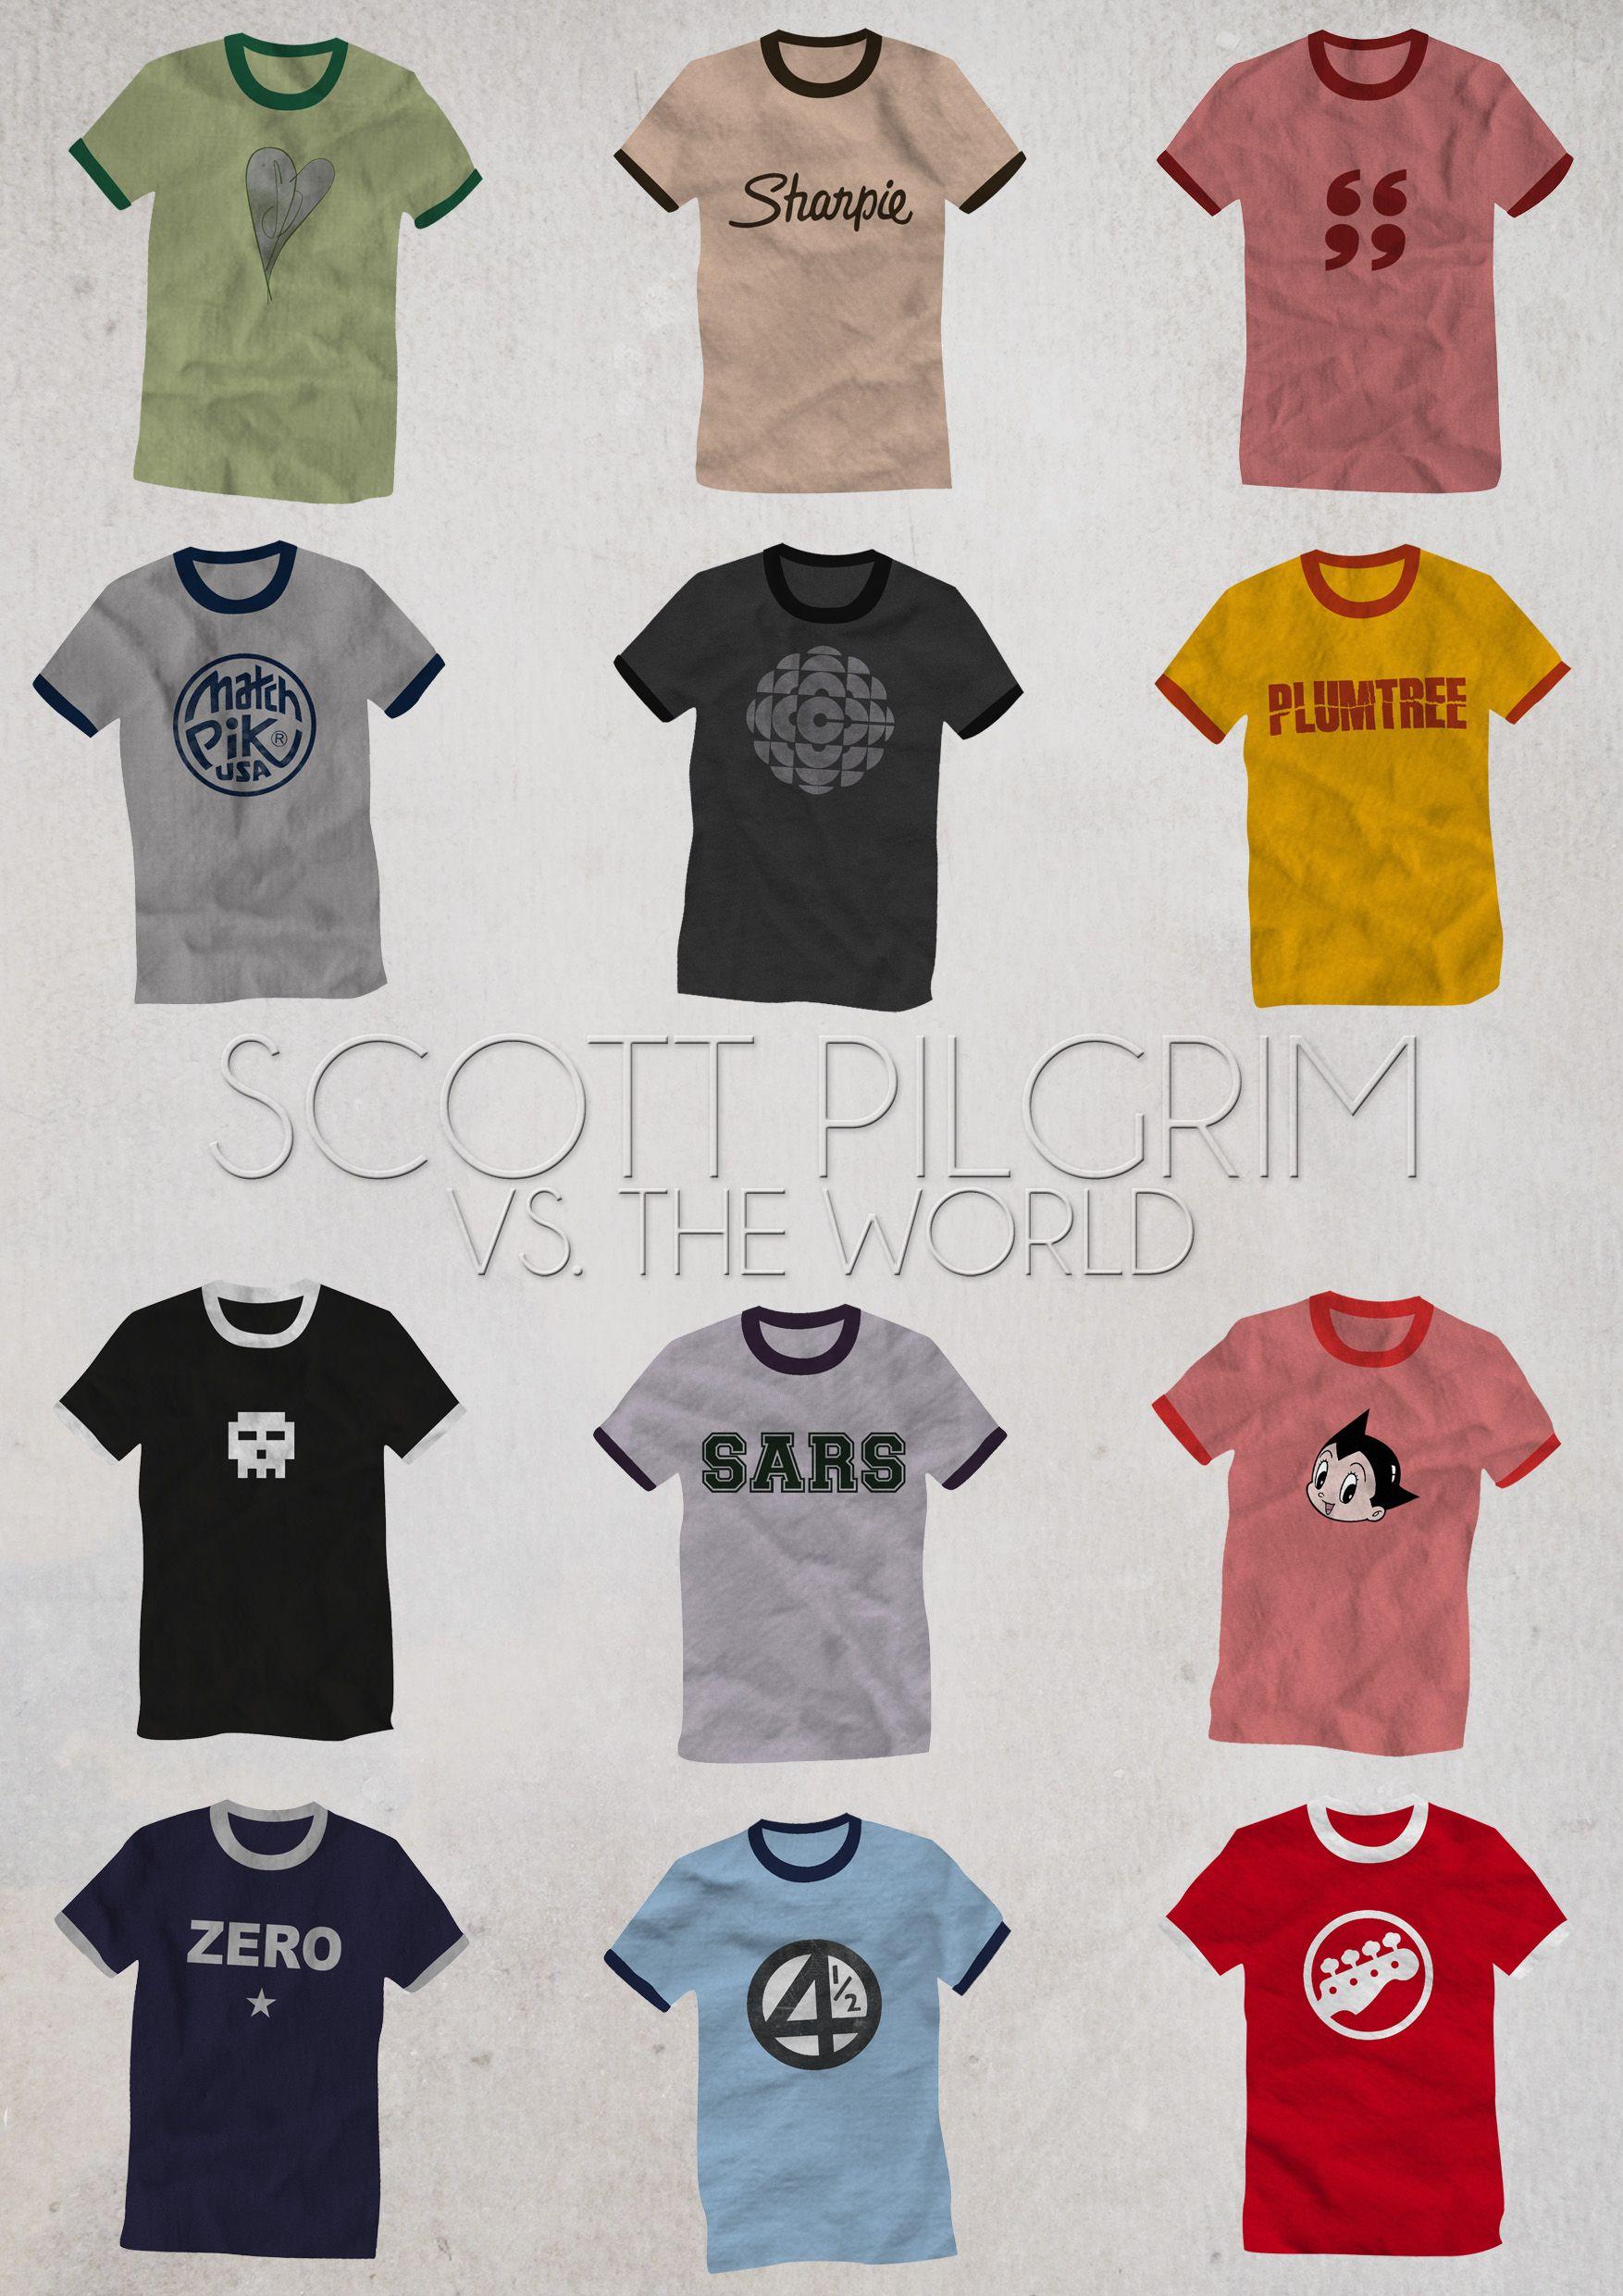 Scott Pilgrim Rockin Youth T-shirt